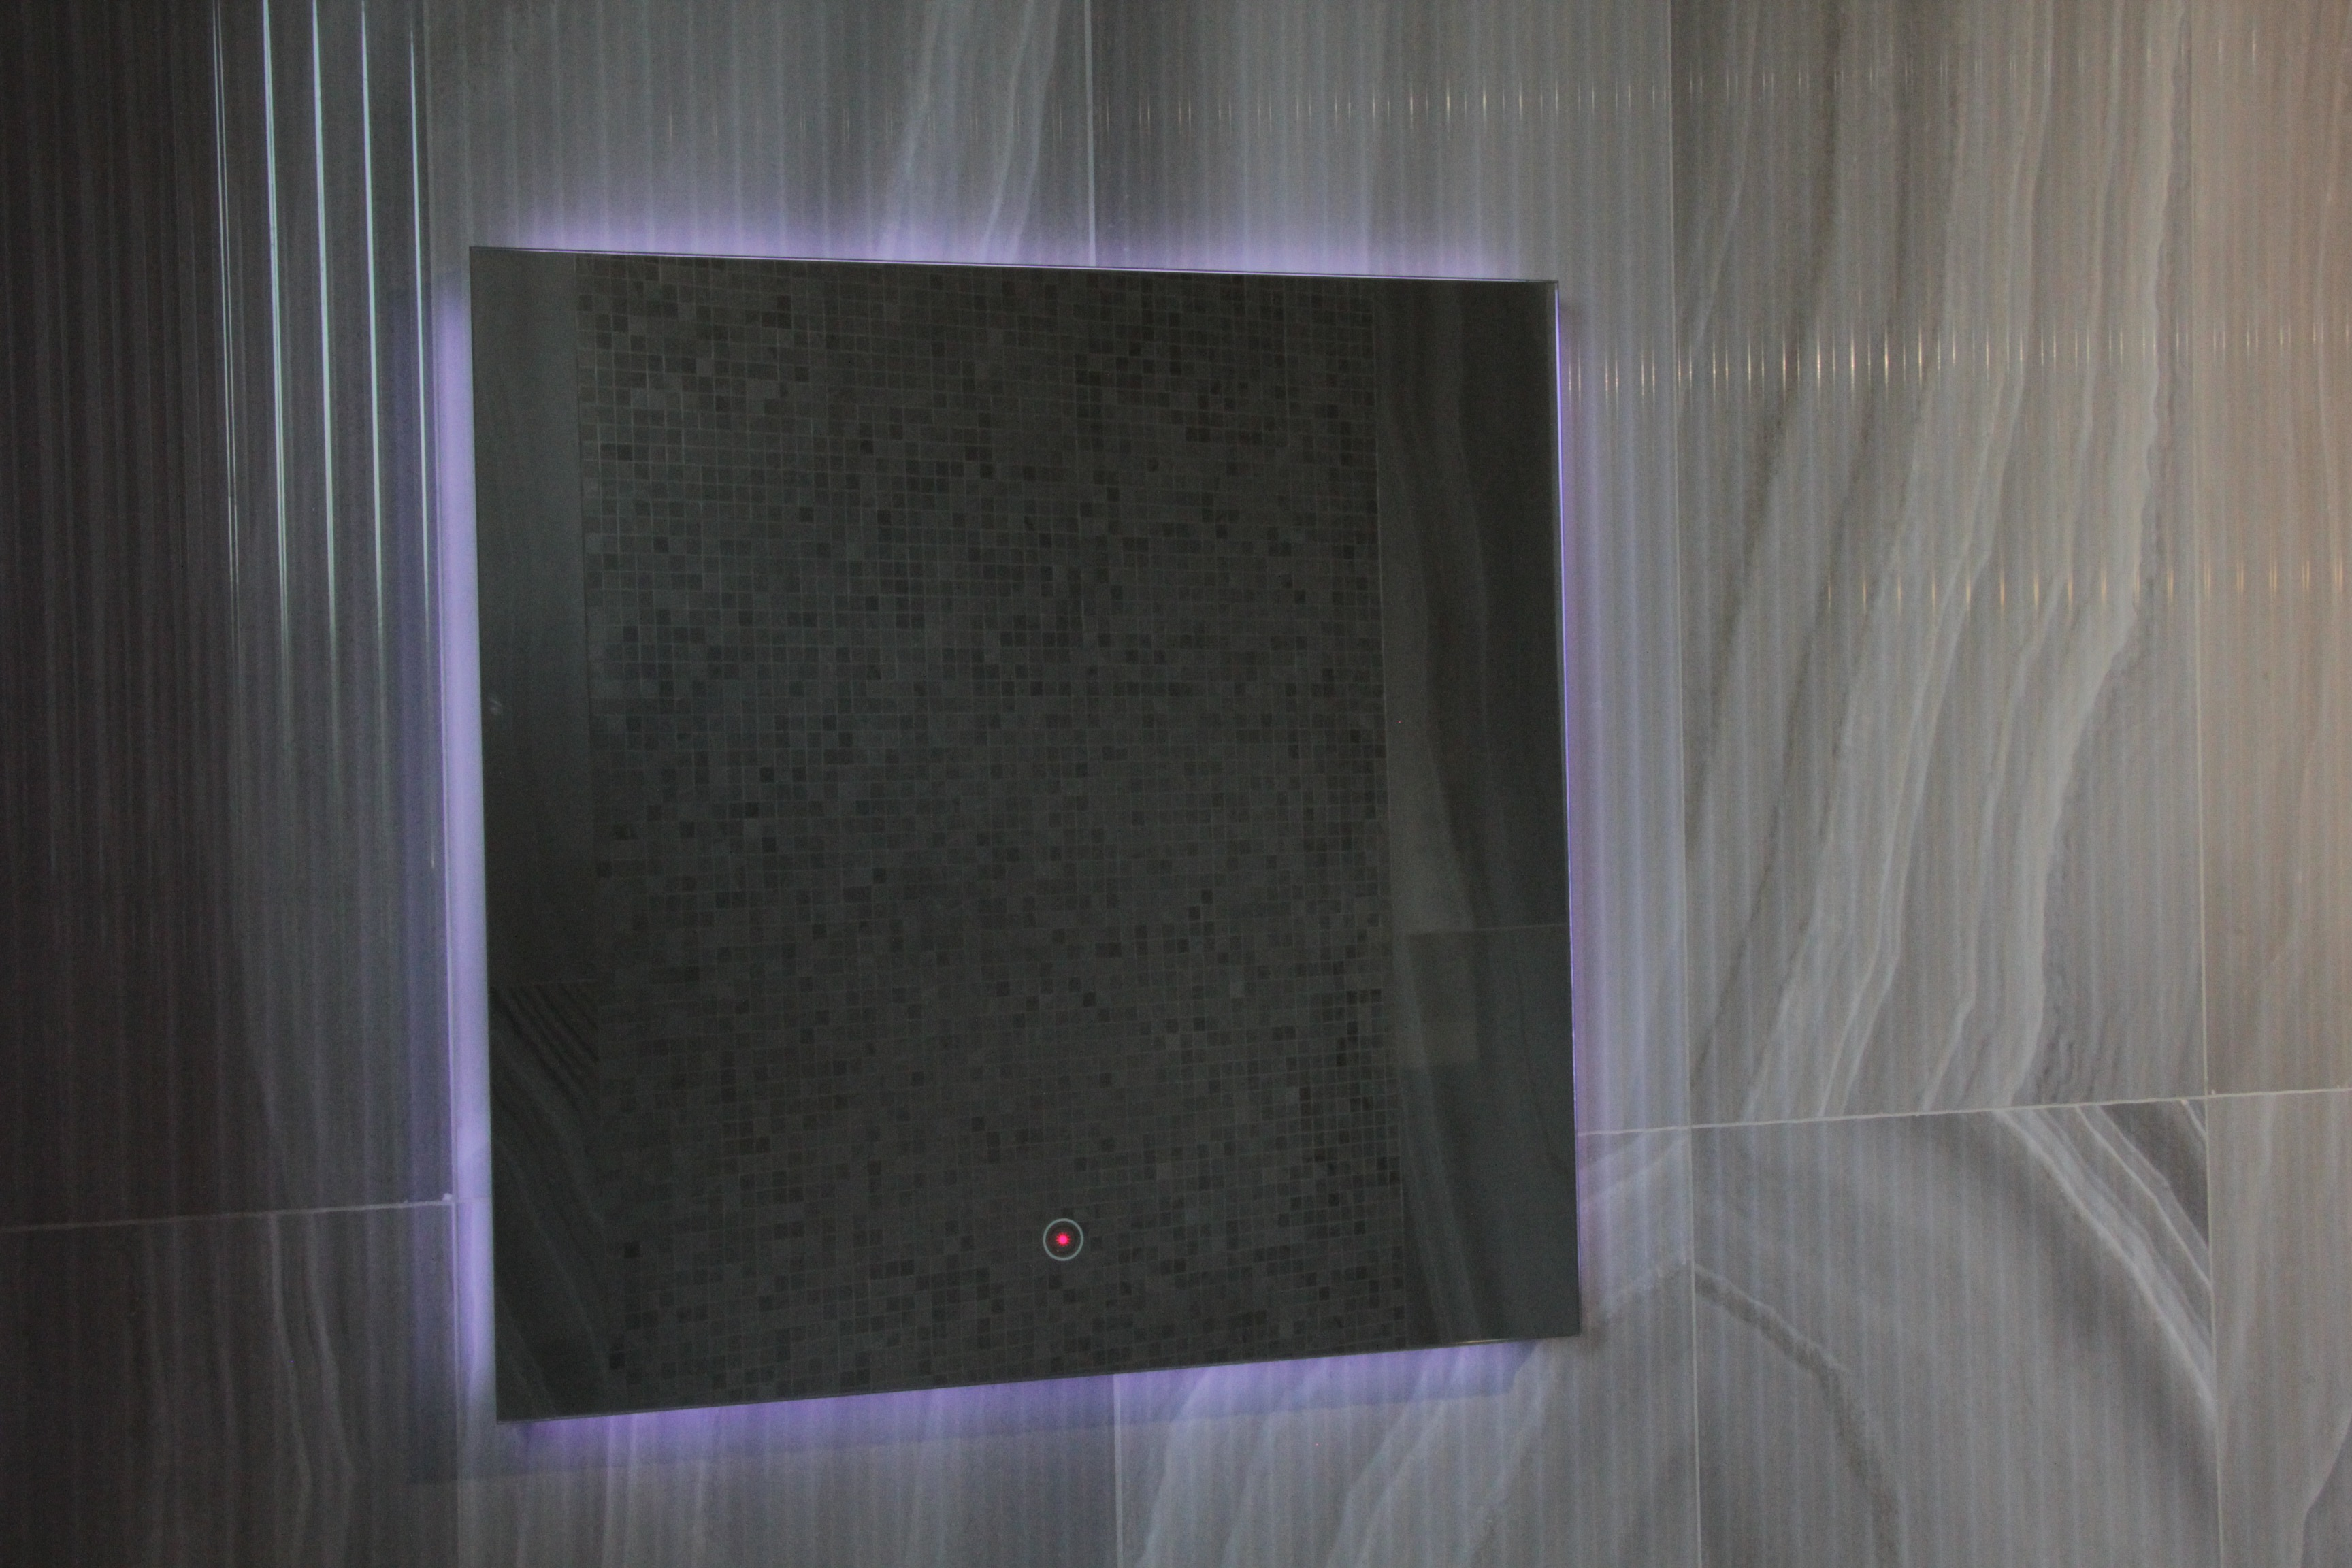 Shine zrkadlo s led osvetlením